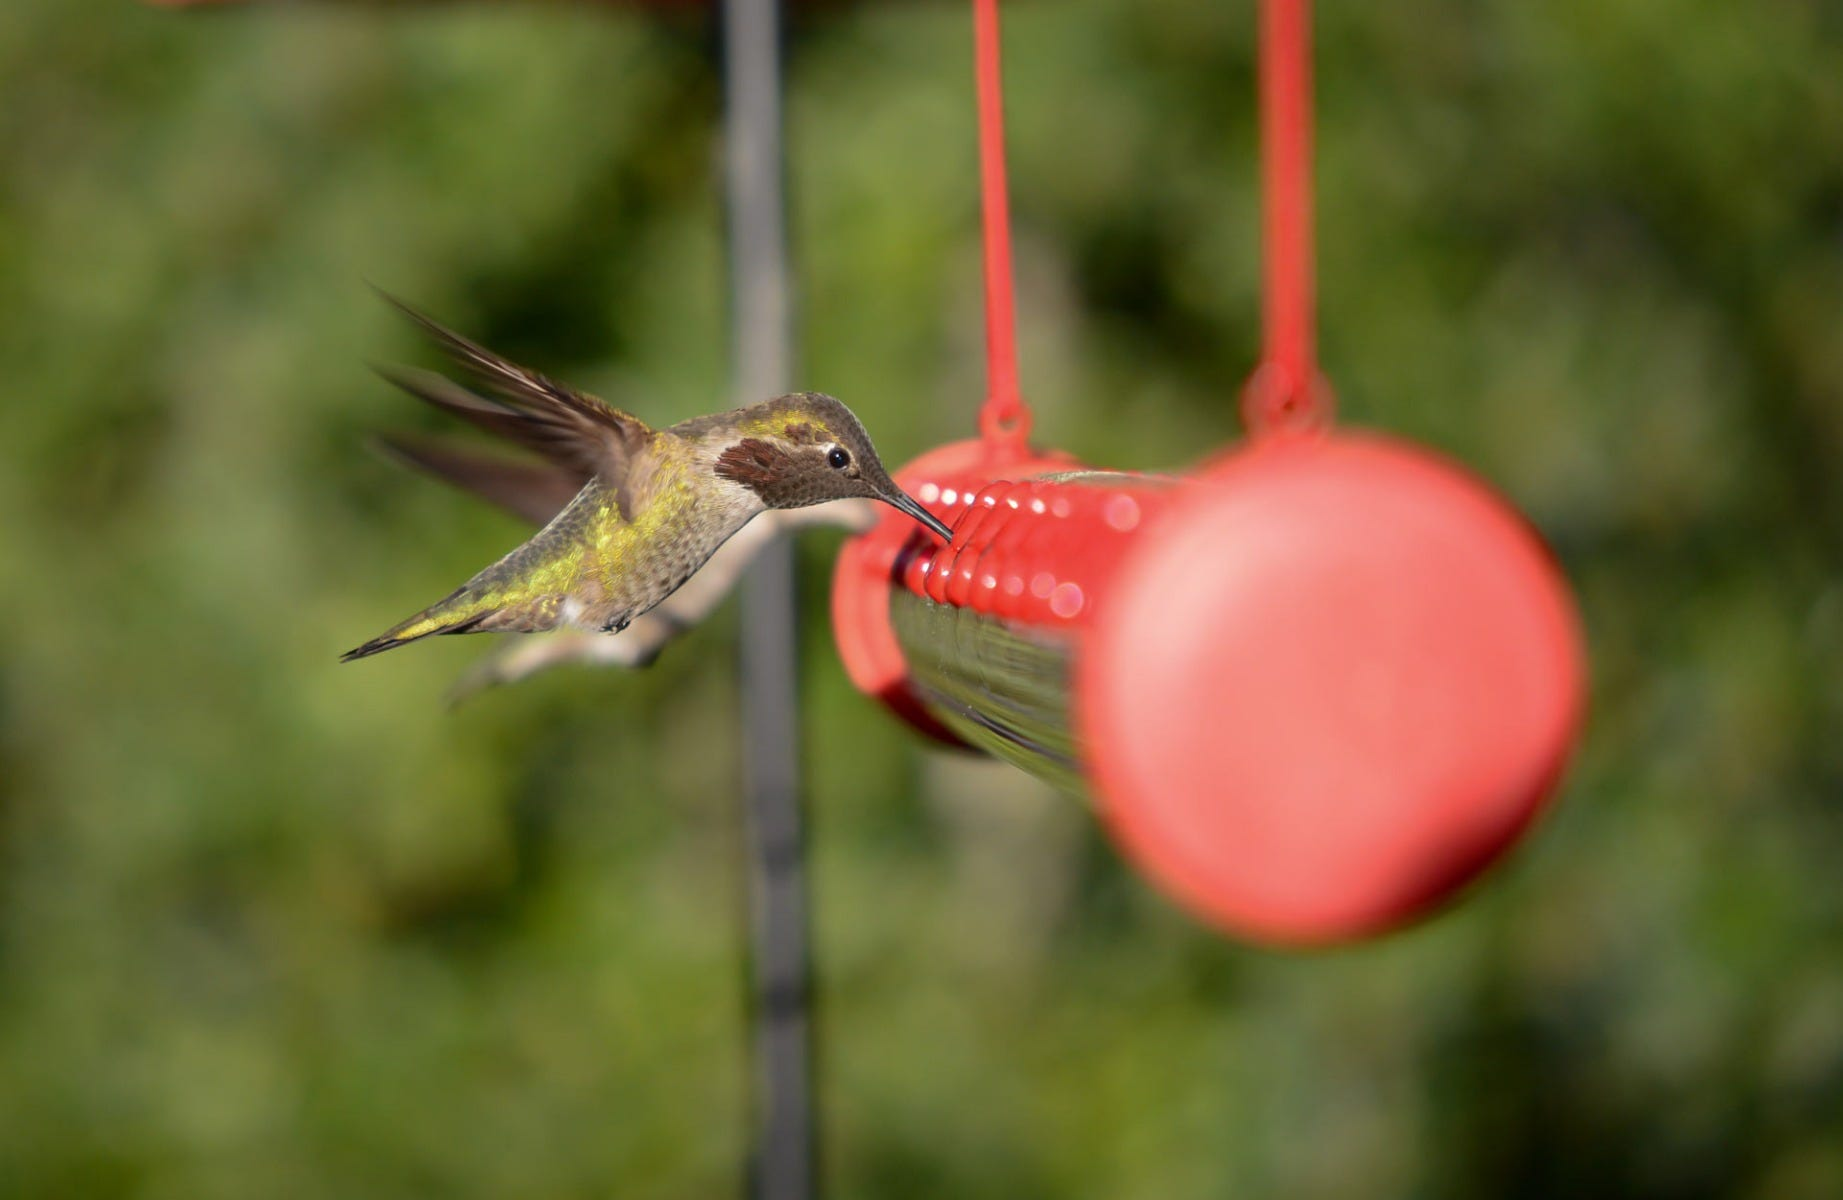 hummerbar hummingbird feeder close up